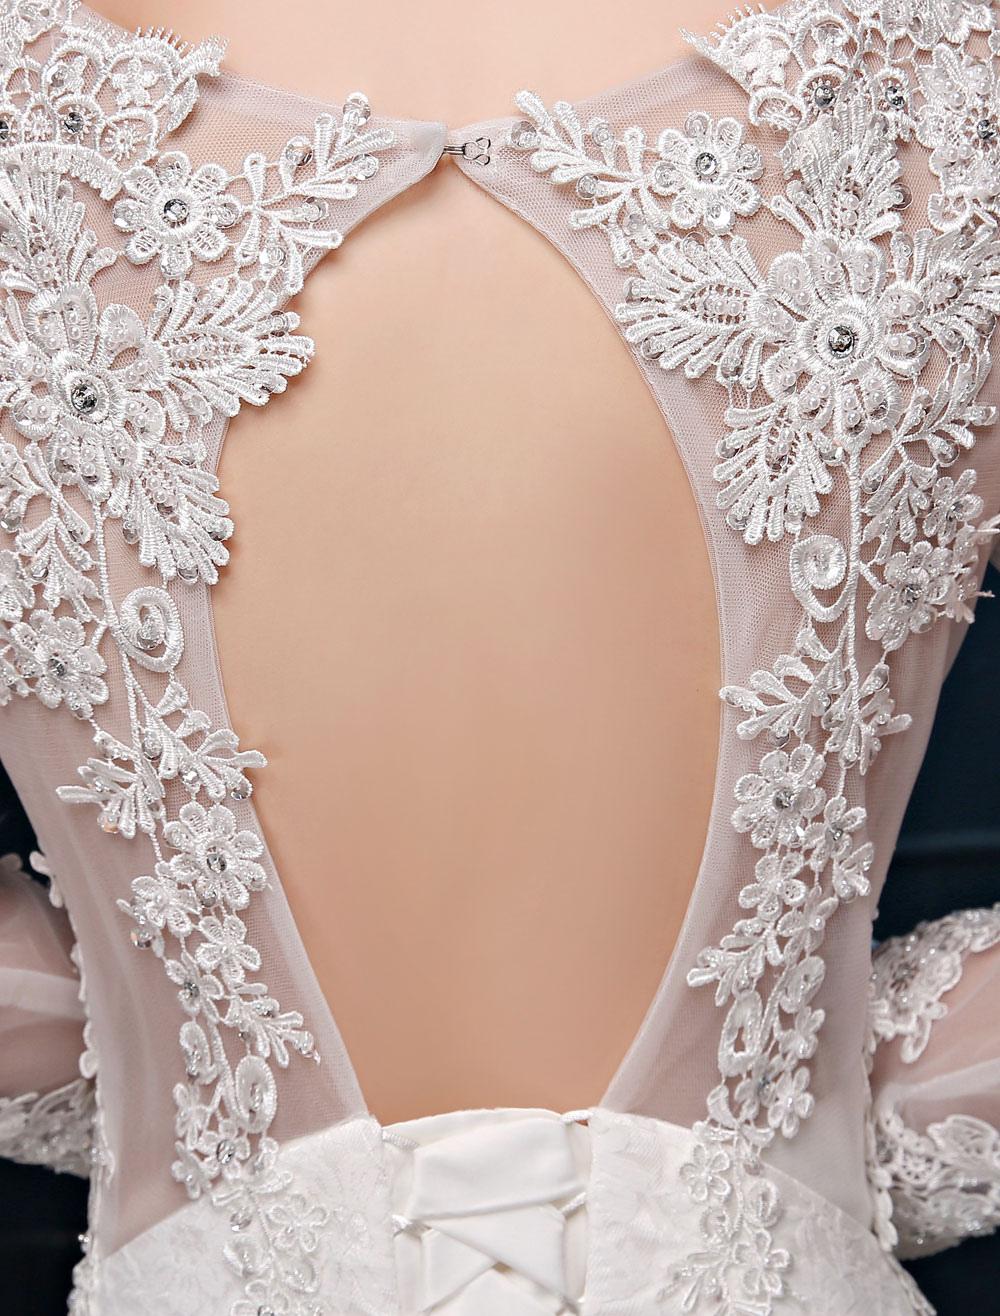 bd28fd7f4afba ... Mermaid Wedding Dresses Lace Beach Bridal Dress Long Sleeve Ivory Open  Back Beaded Illusion Wedding Gown